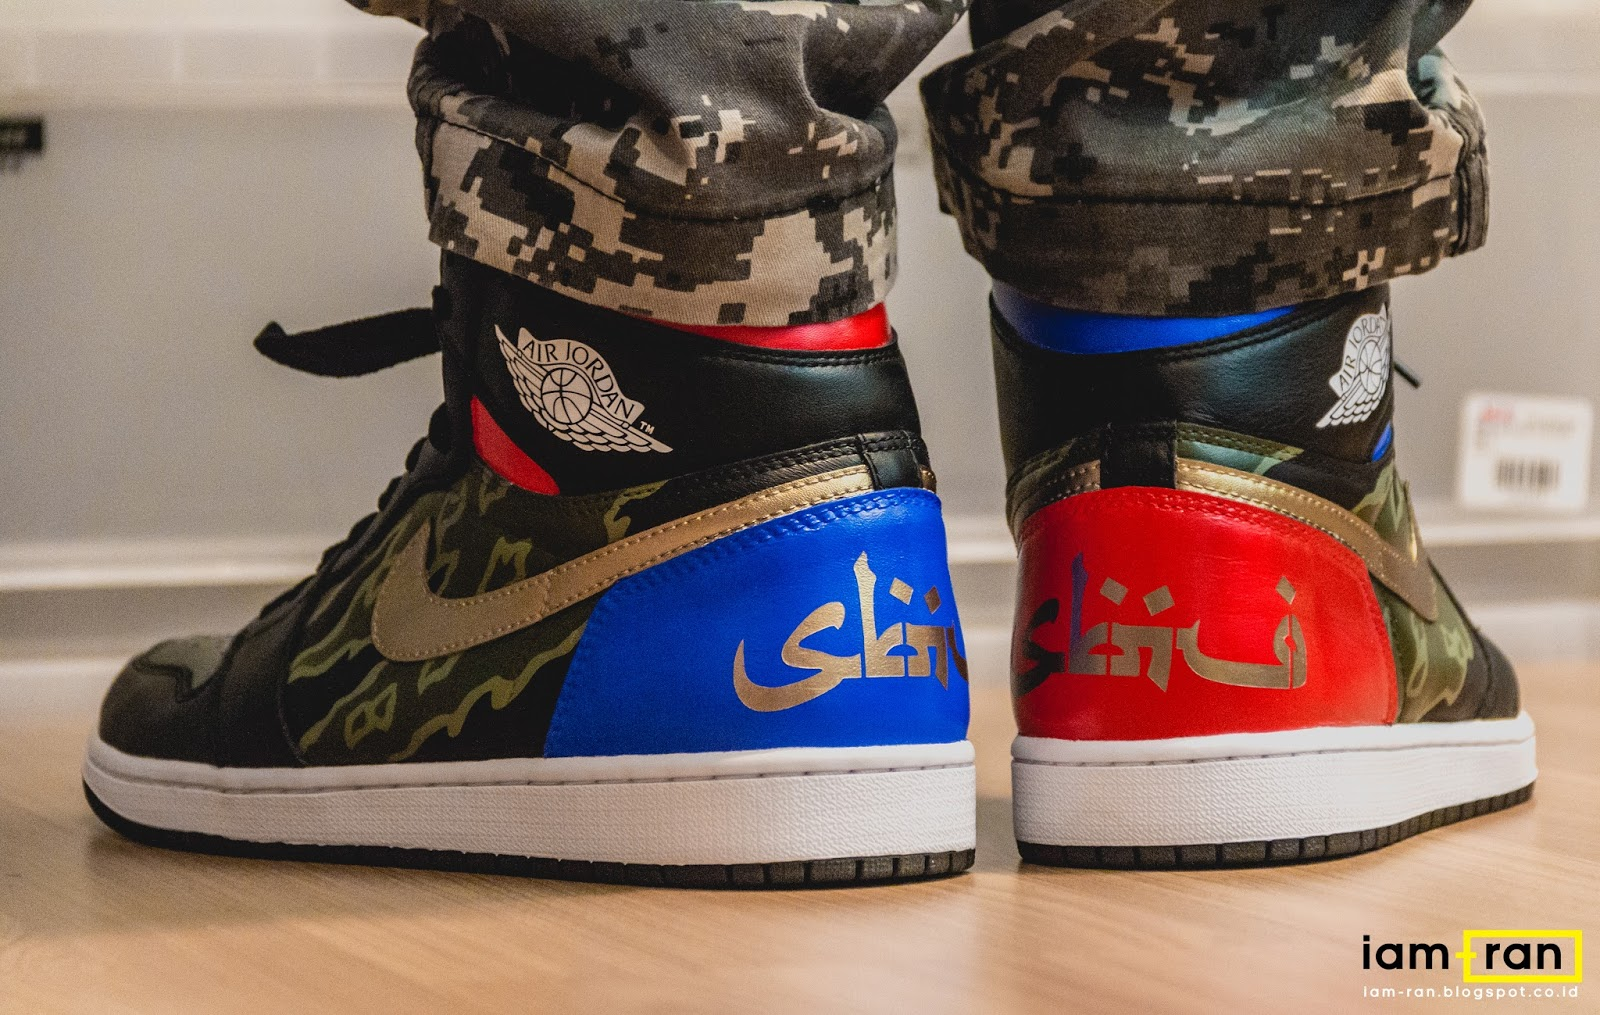 5526df19faa IAM-RAN: ON FEET : Dipsky - Nike Air Jordan 1 x SBTG